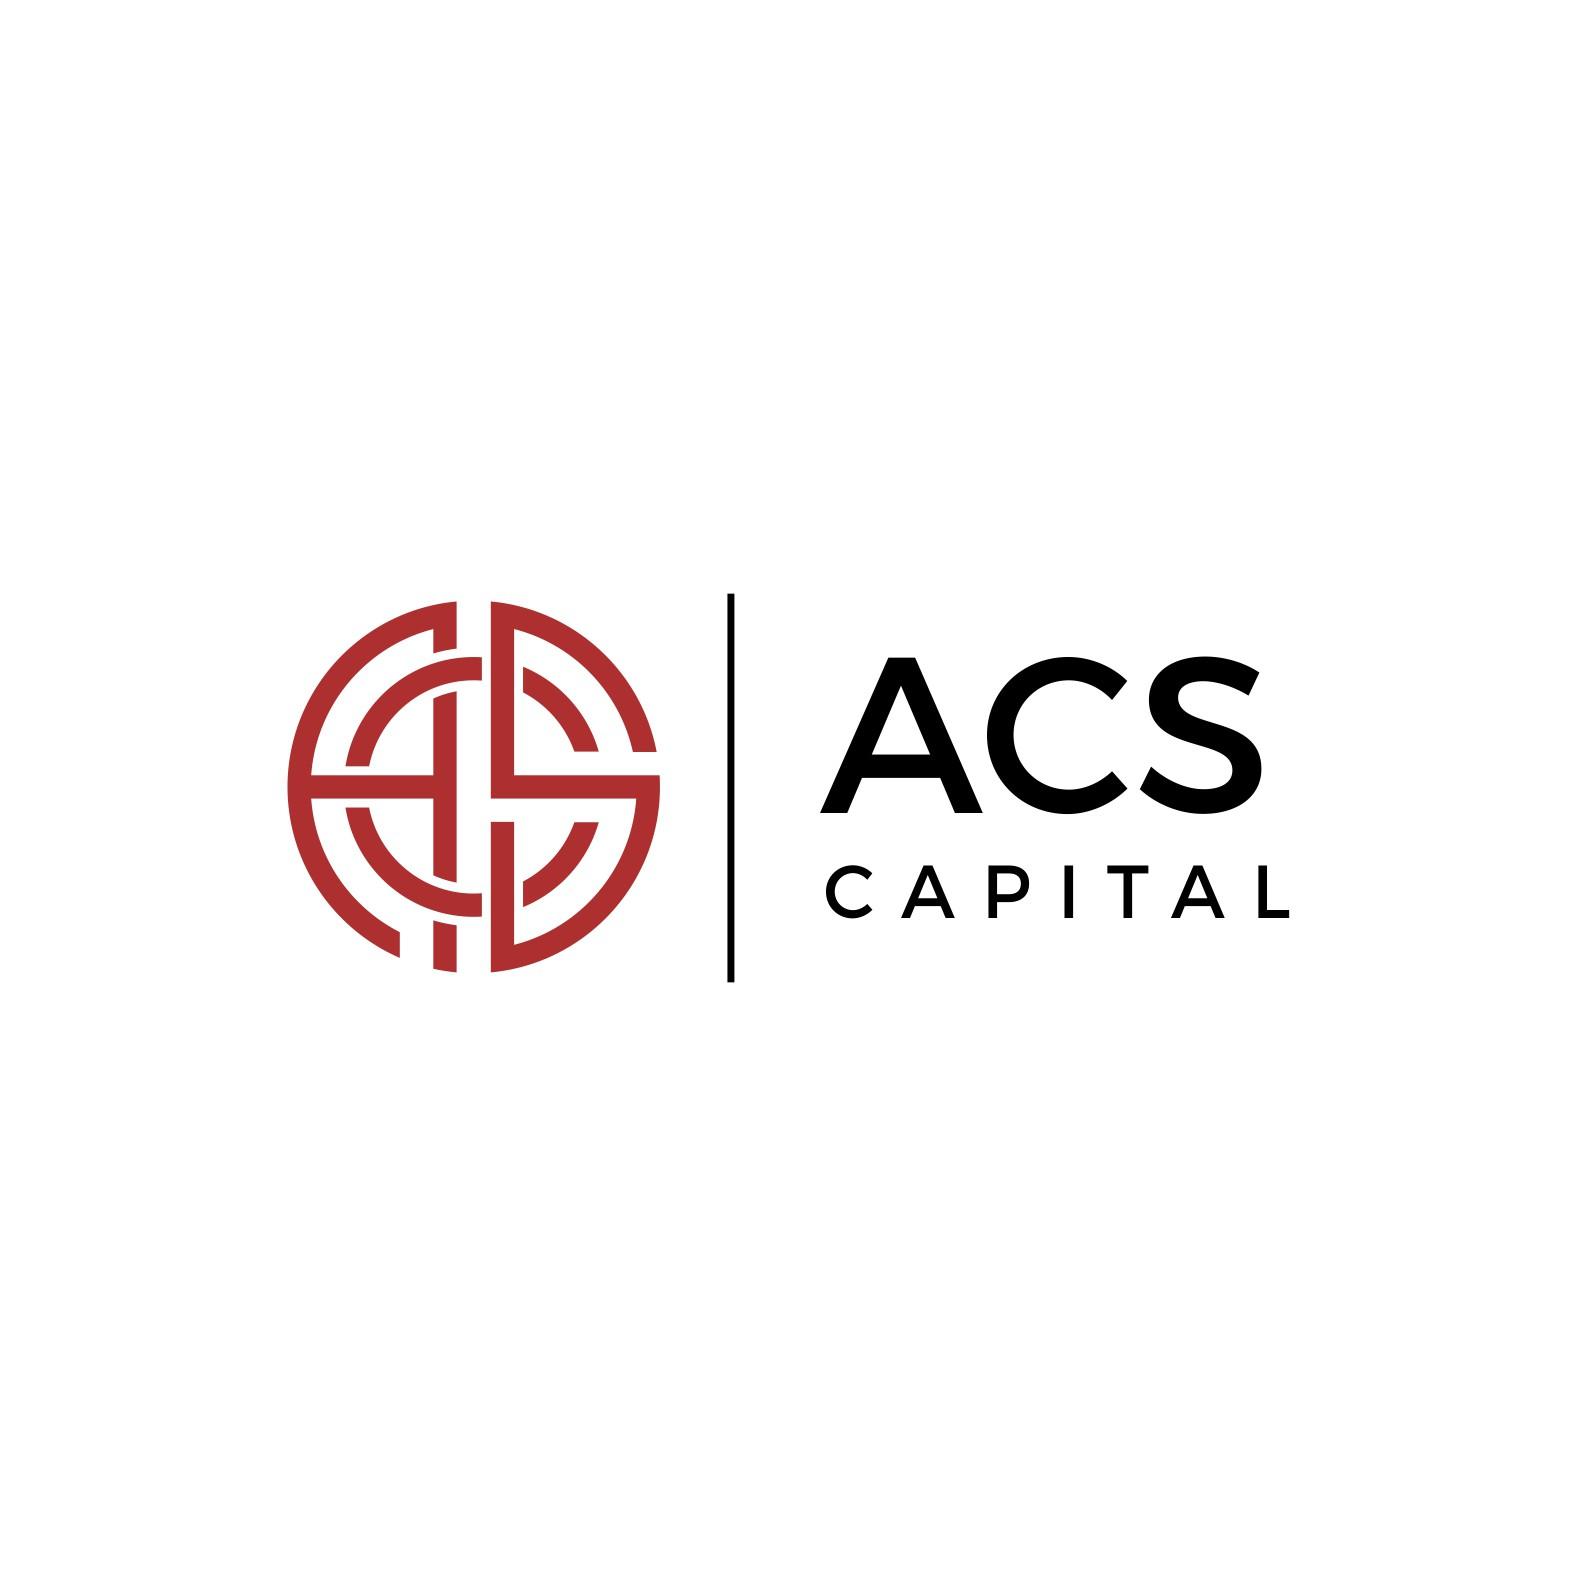 ACS Capital - Entrepreneurial  Business Holding Company